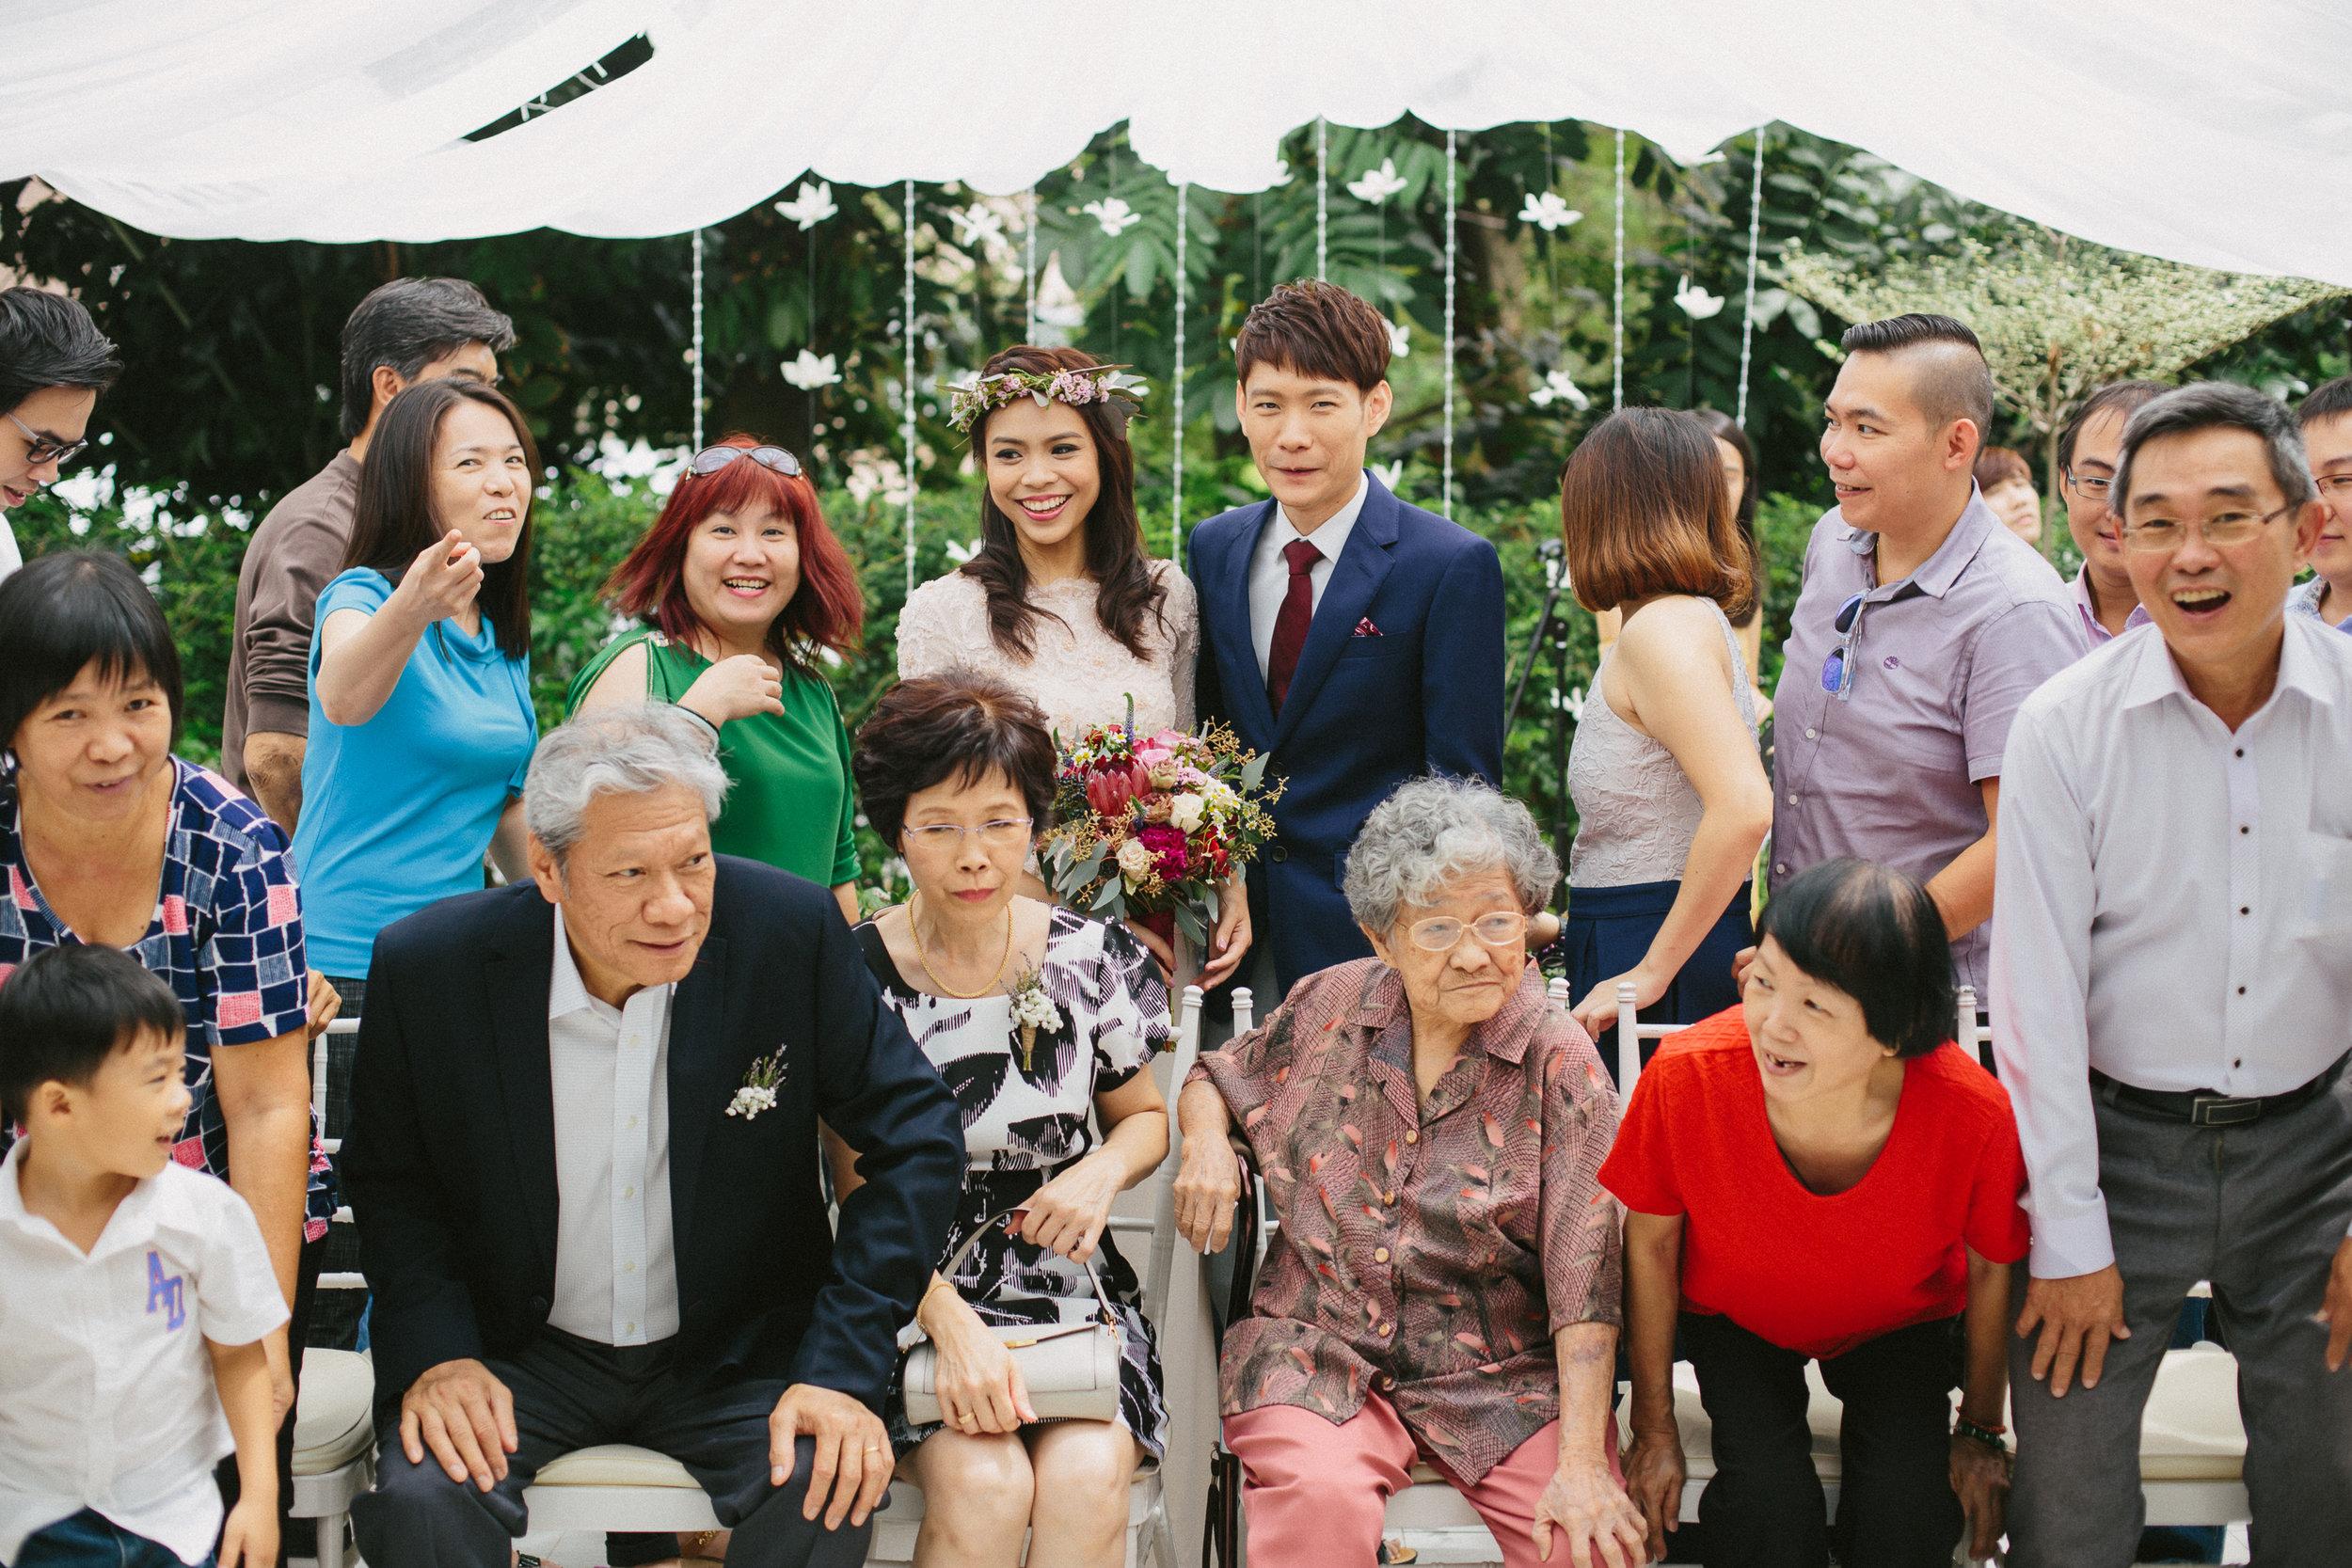 singapore-wedding-photographer-fadilah-kwan-066.jpg